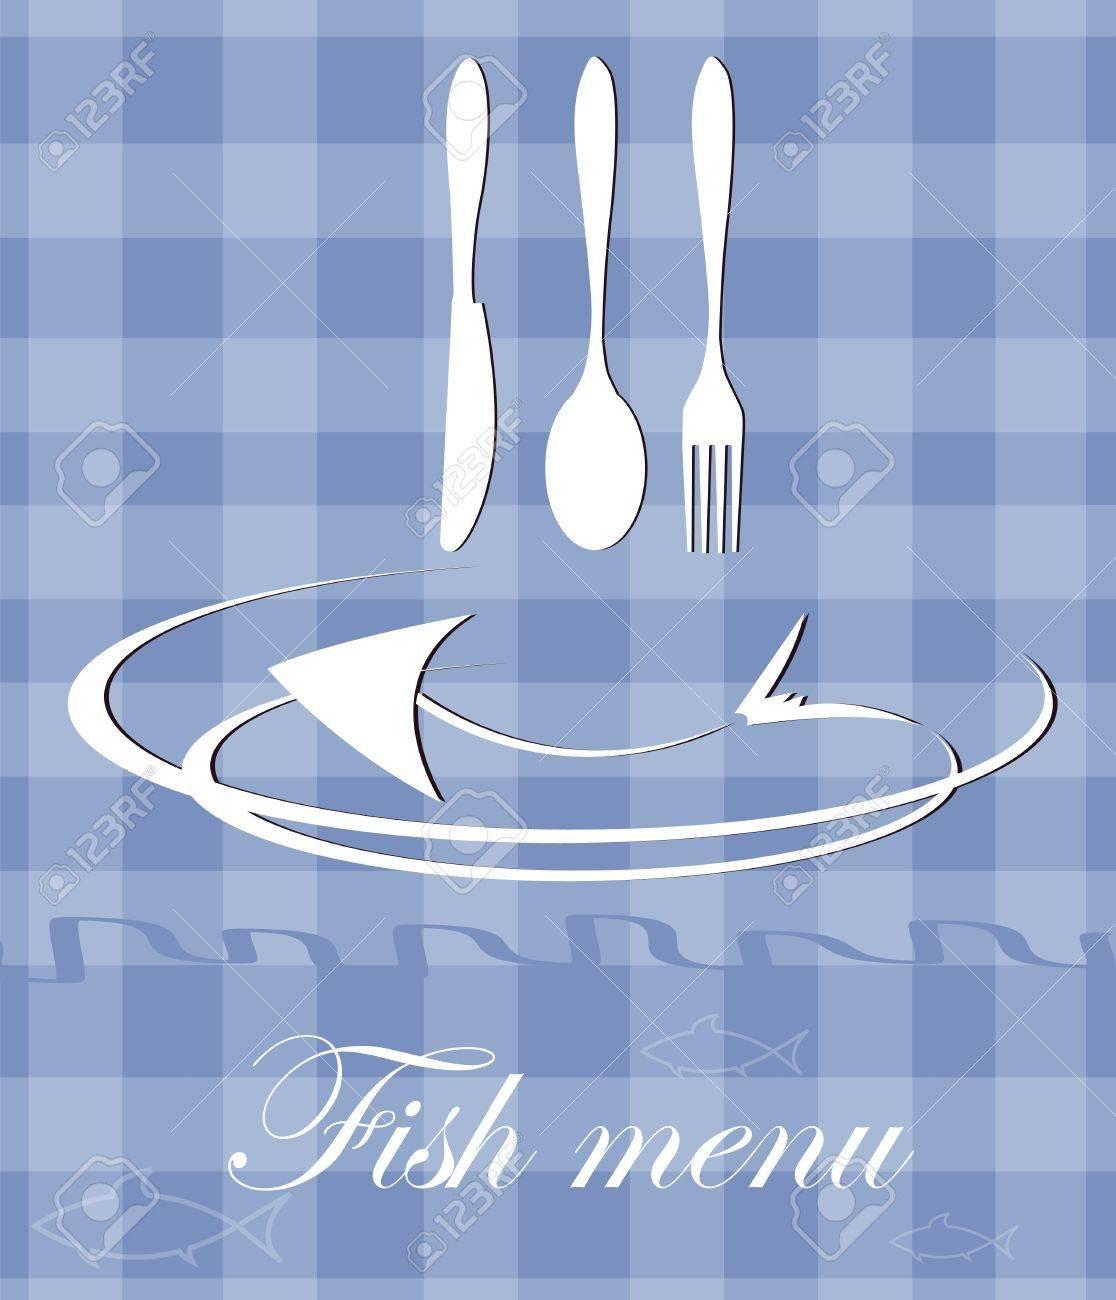 fish menu for restaurant Stock Vector - 12463858